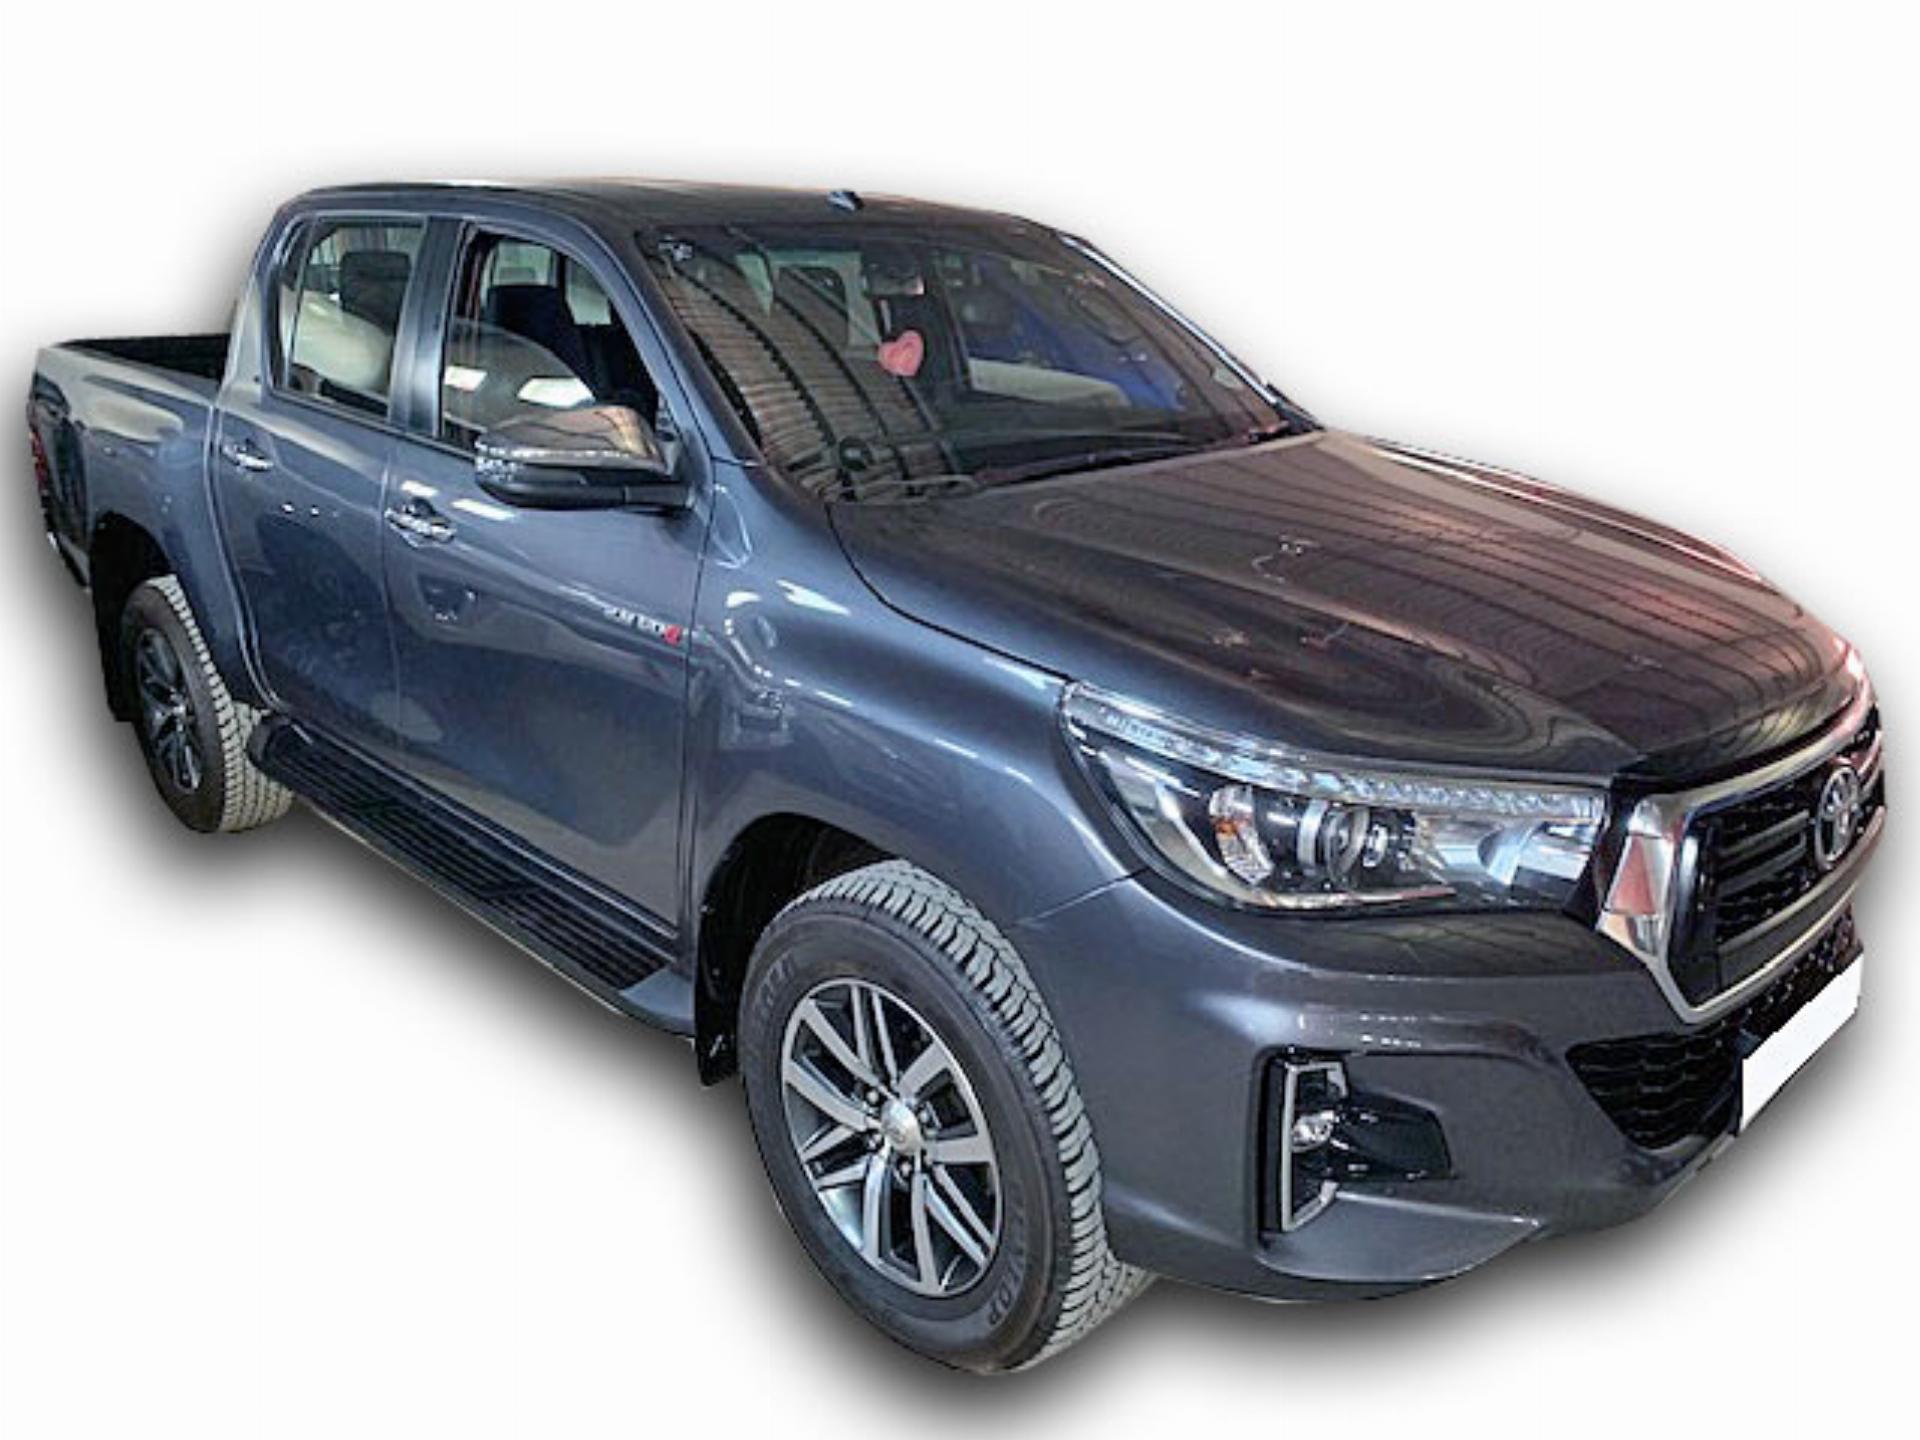 Toyota Hilux 2.8 GD-6 Raider 4